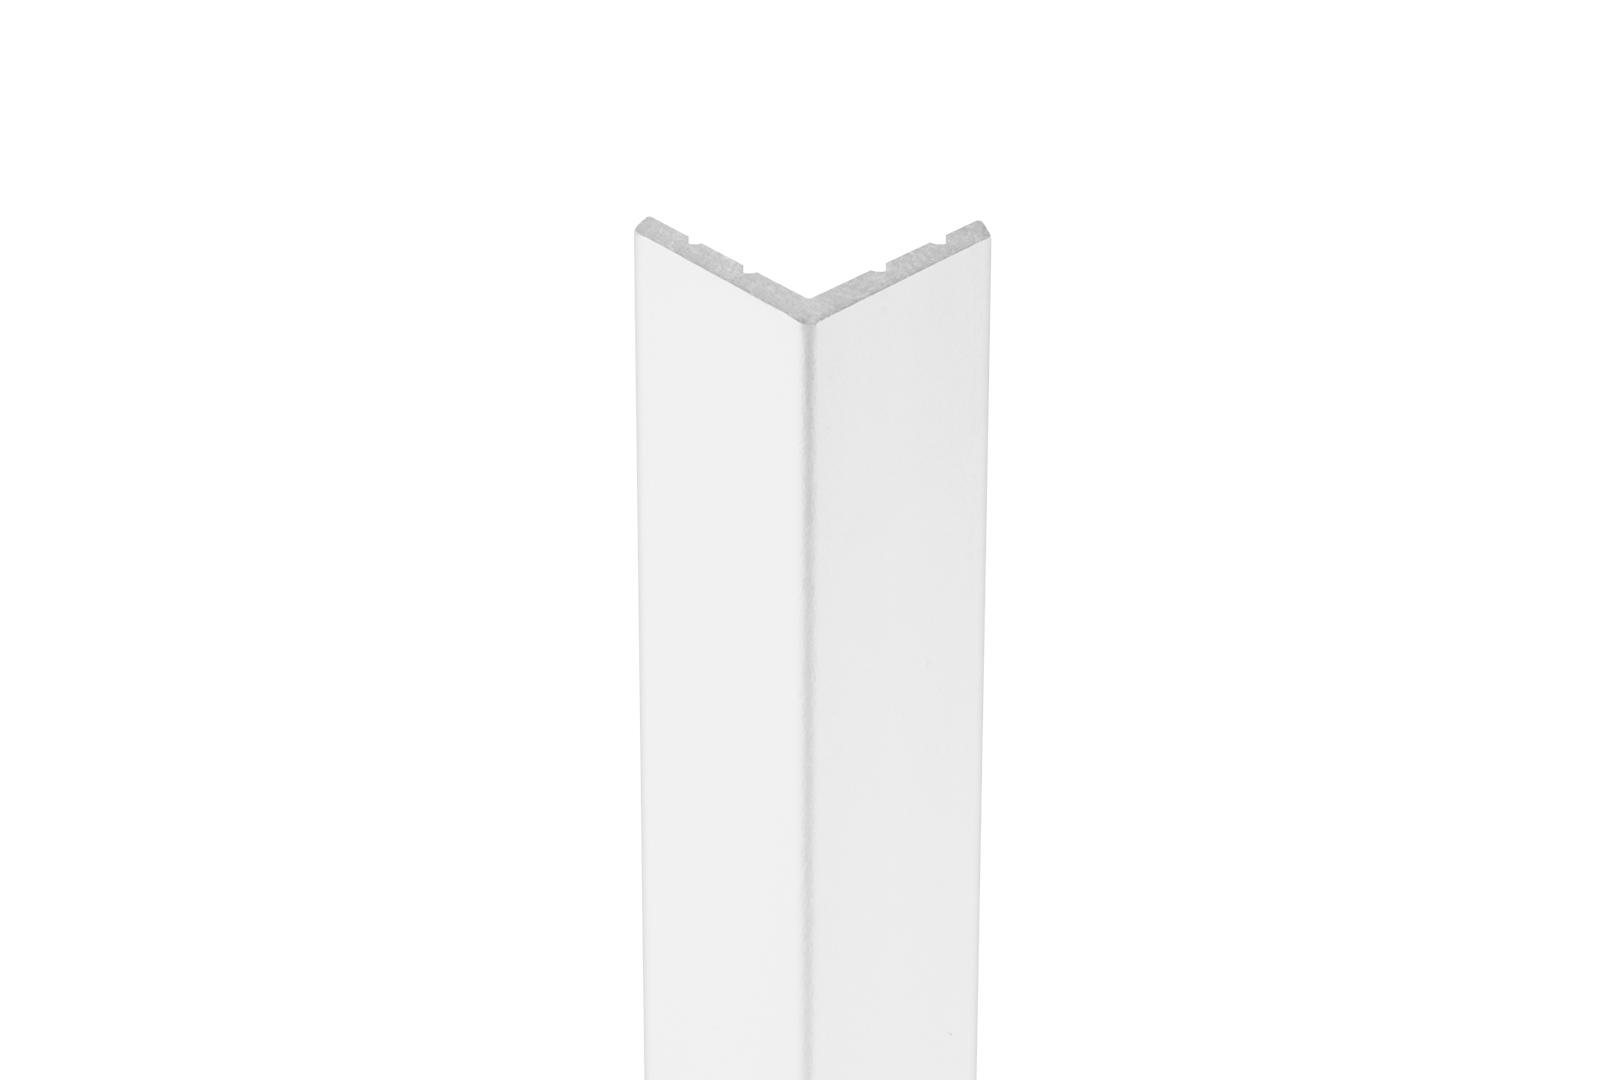 2 Meter   Außenecke   Ecopolimer   stoßfest   Cosca   18x18mm   CA2